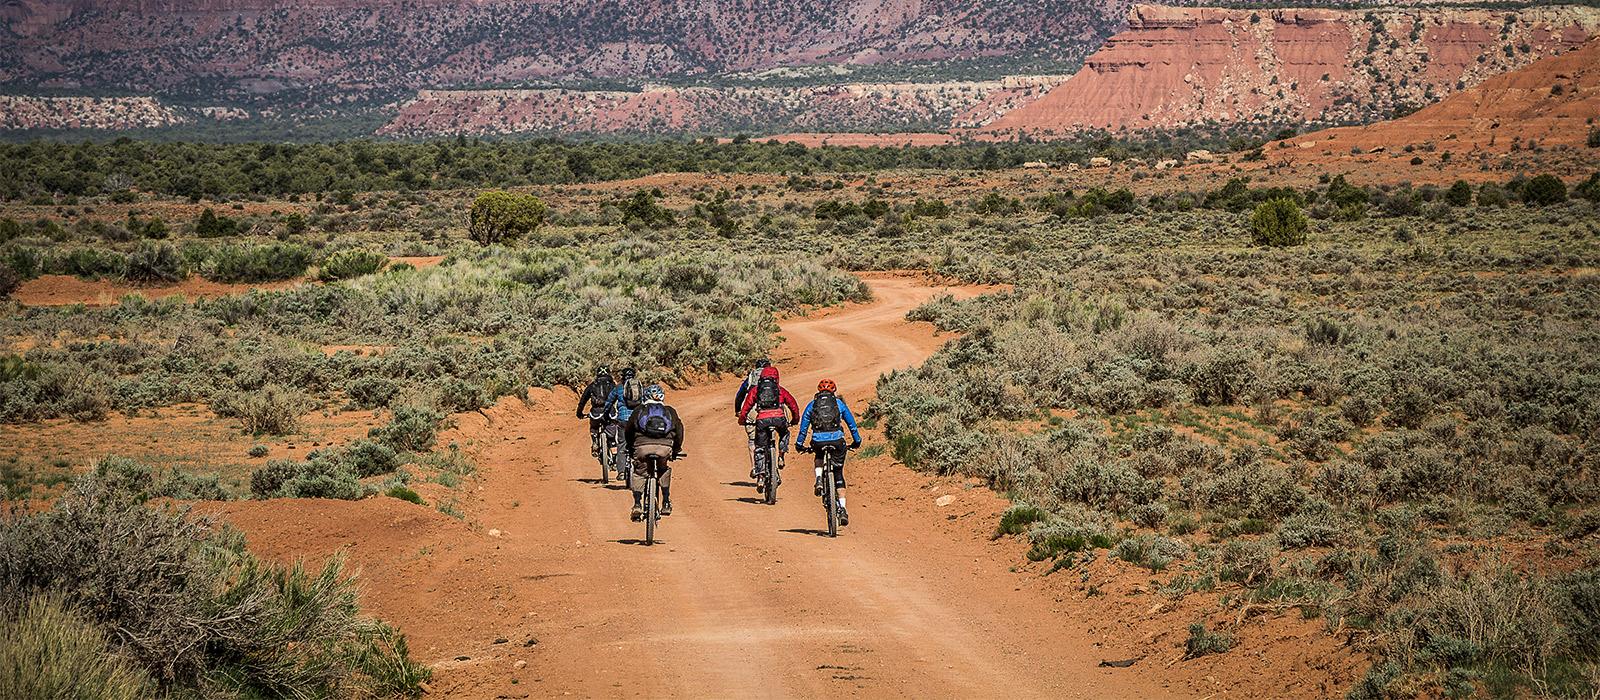 Riders traveling through a beautiful desert.